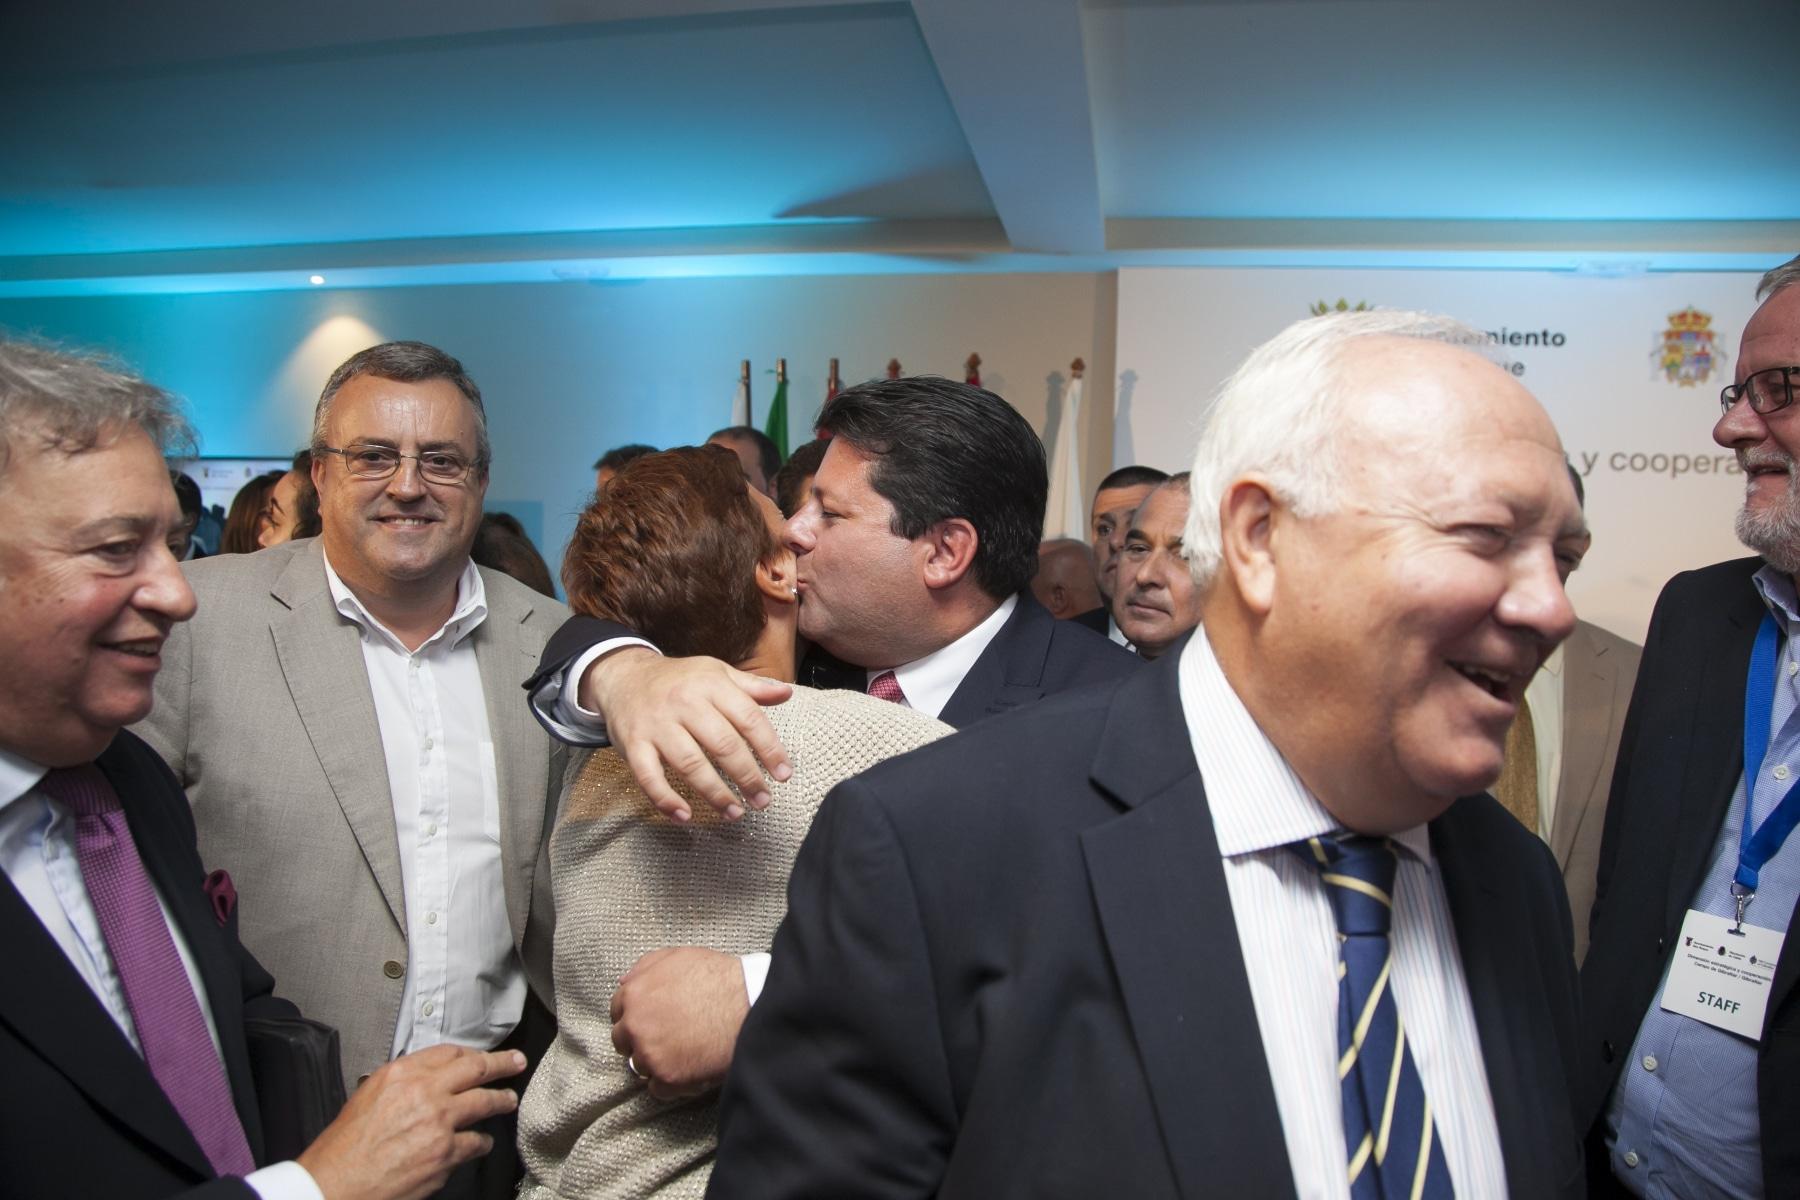 a-exalcaldesa-de-la-lnea-de-la-concepcin-gemma-araujo-psoe-saluda-al-ministro-principal-de-gibraltar-fabian-picardo_21423551375_o